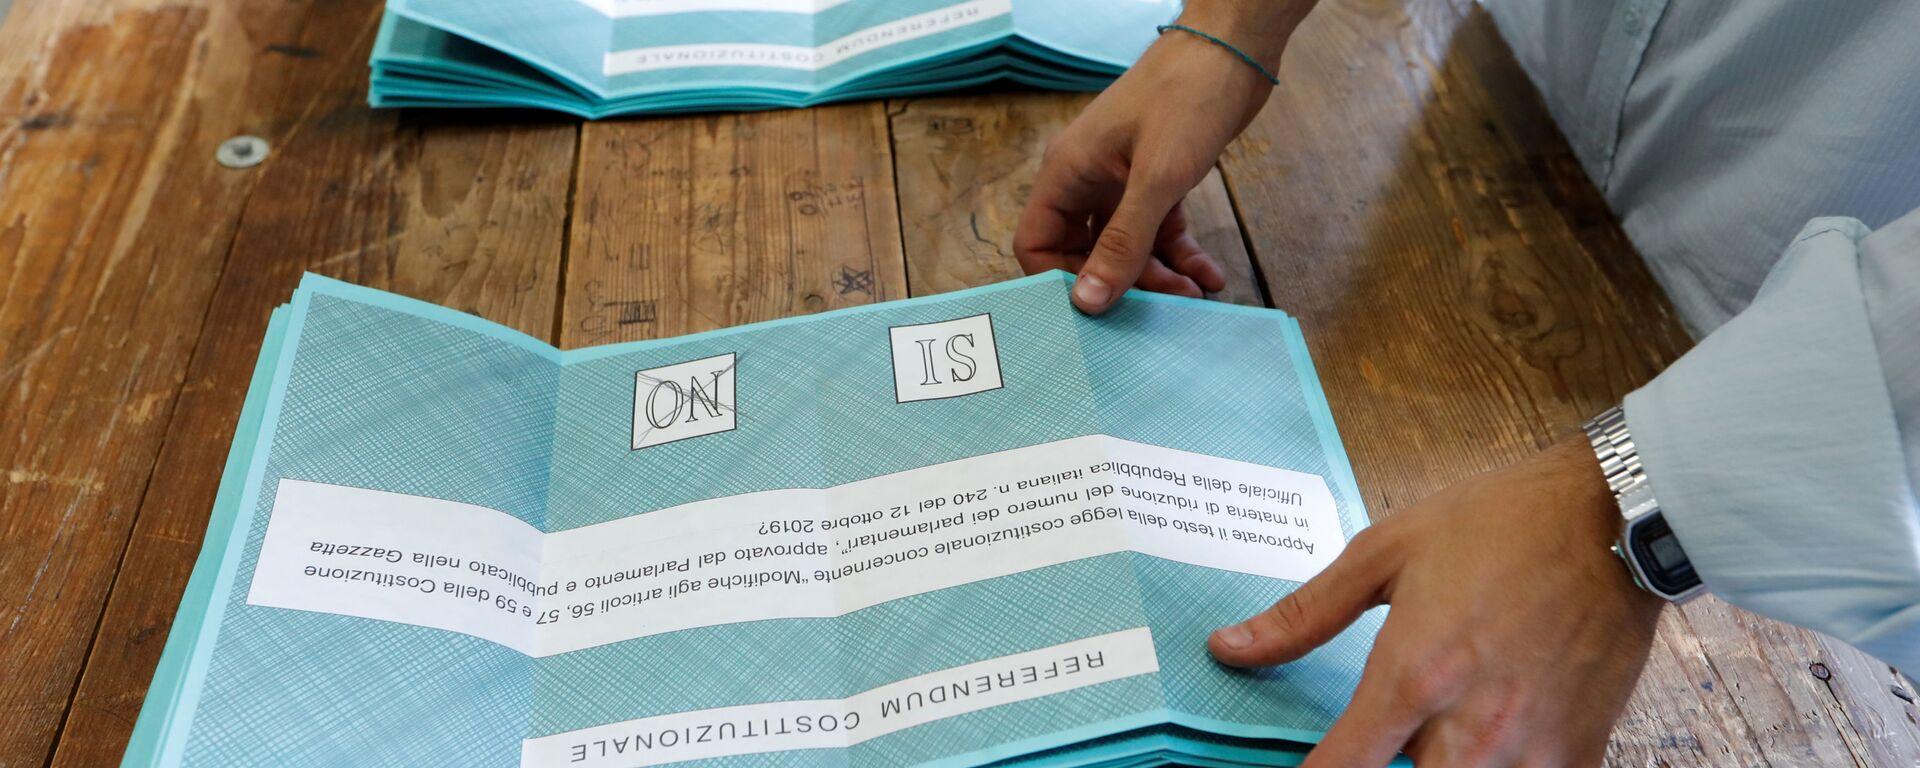 Referendum taglio parlamentari a Roma - Sputnik Italia, 1920, 01.06.2021